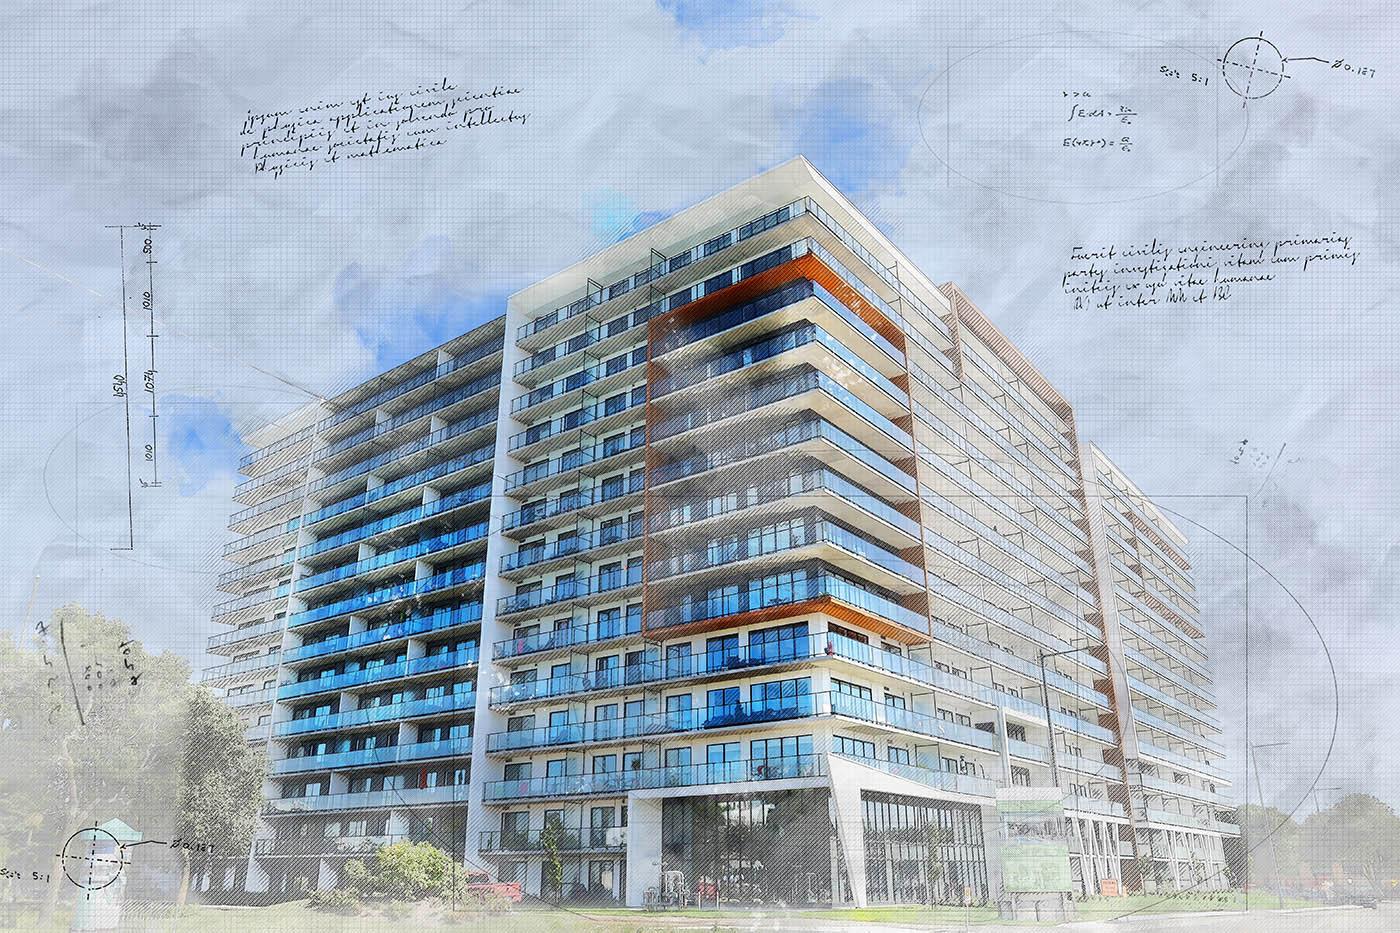 Large Condominium Building Sketch Image - Stock Photography